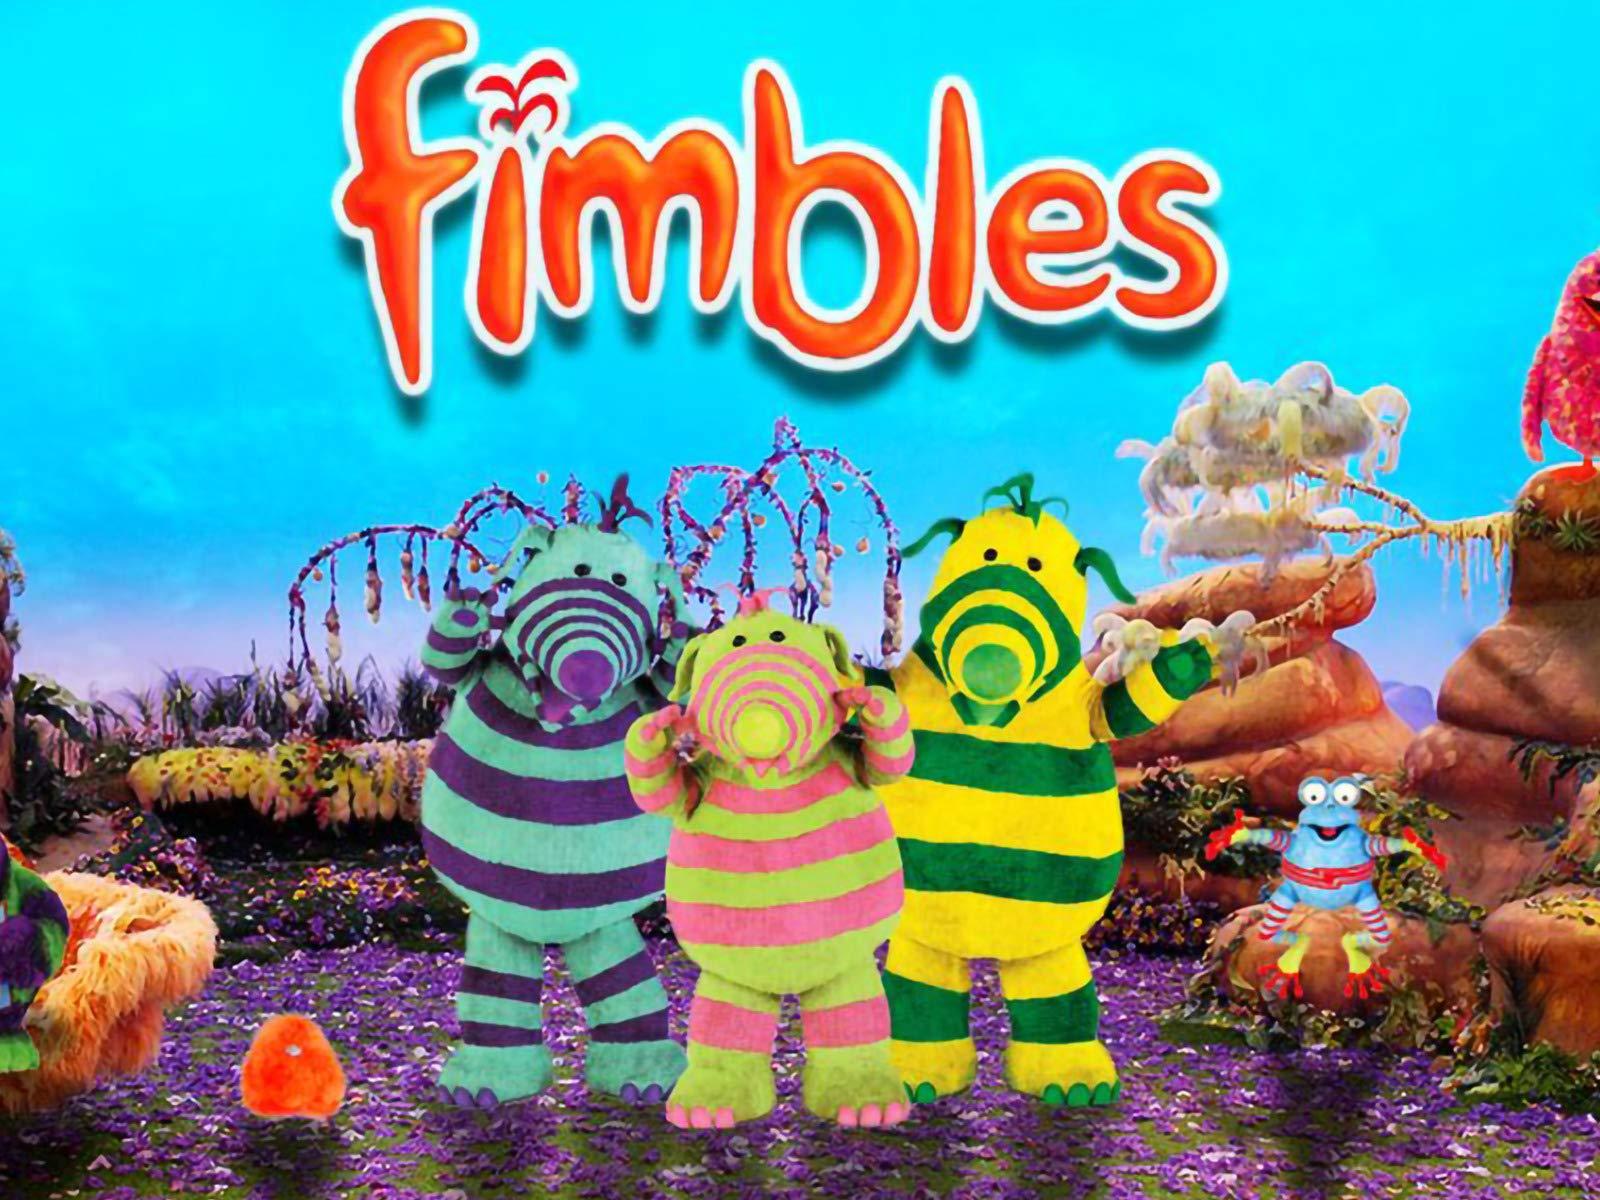 The Fimbles